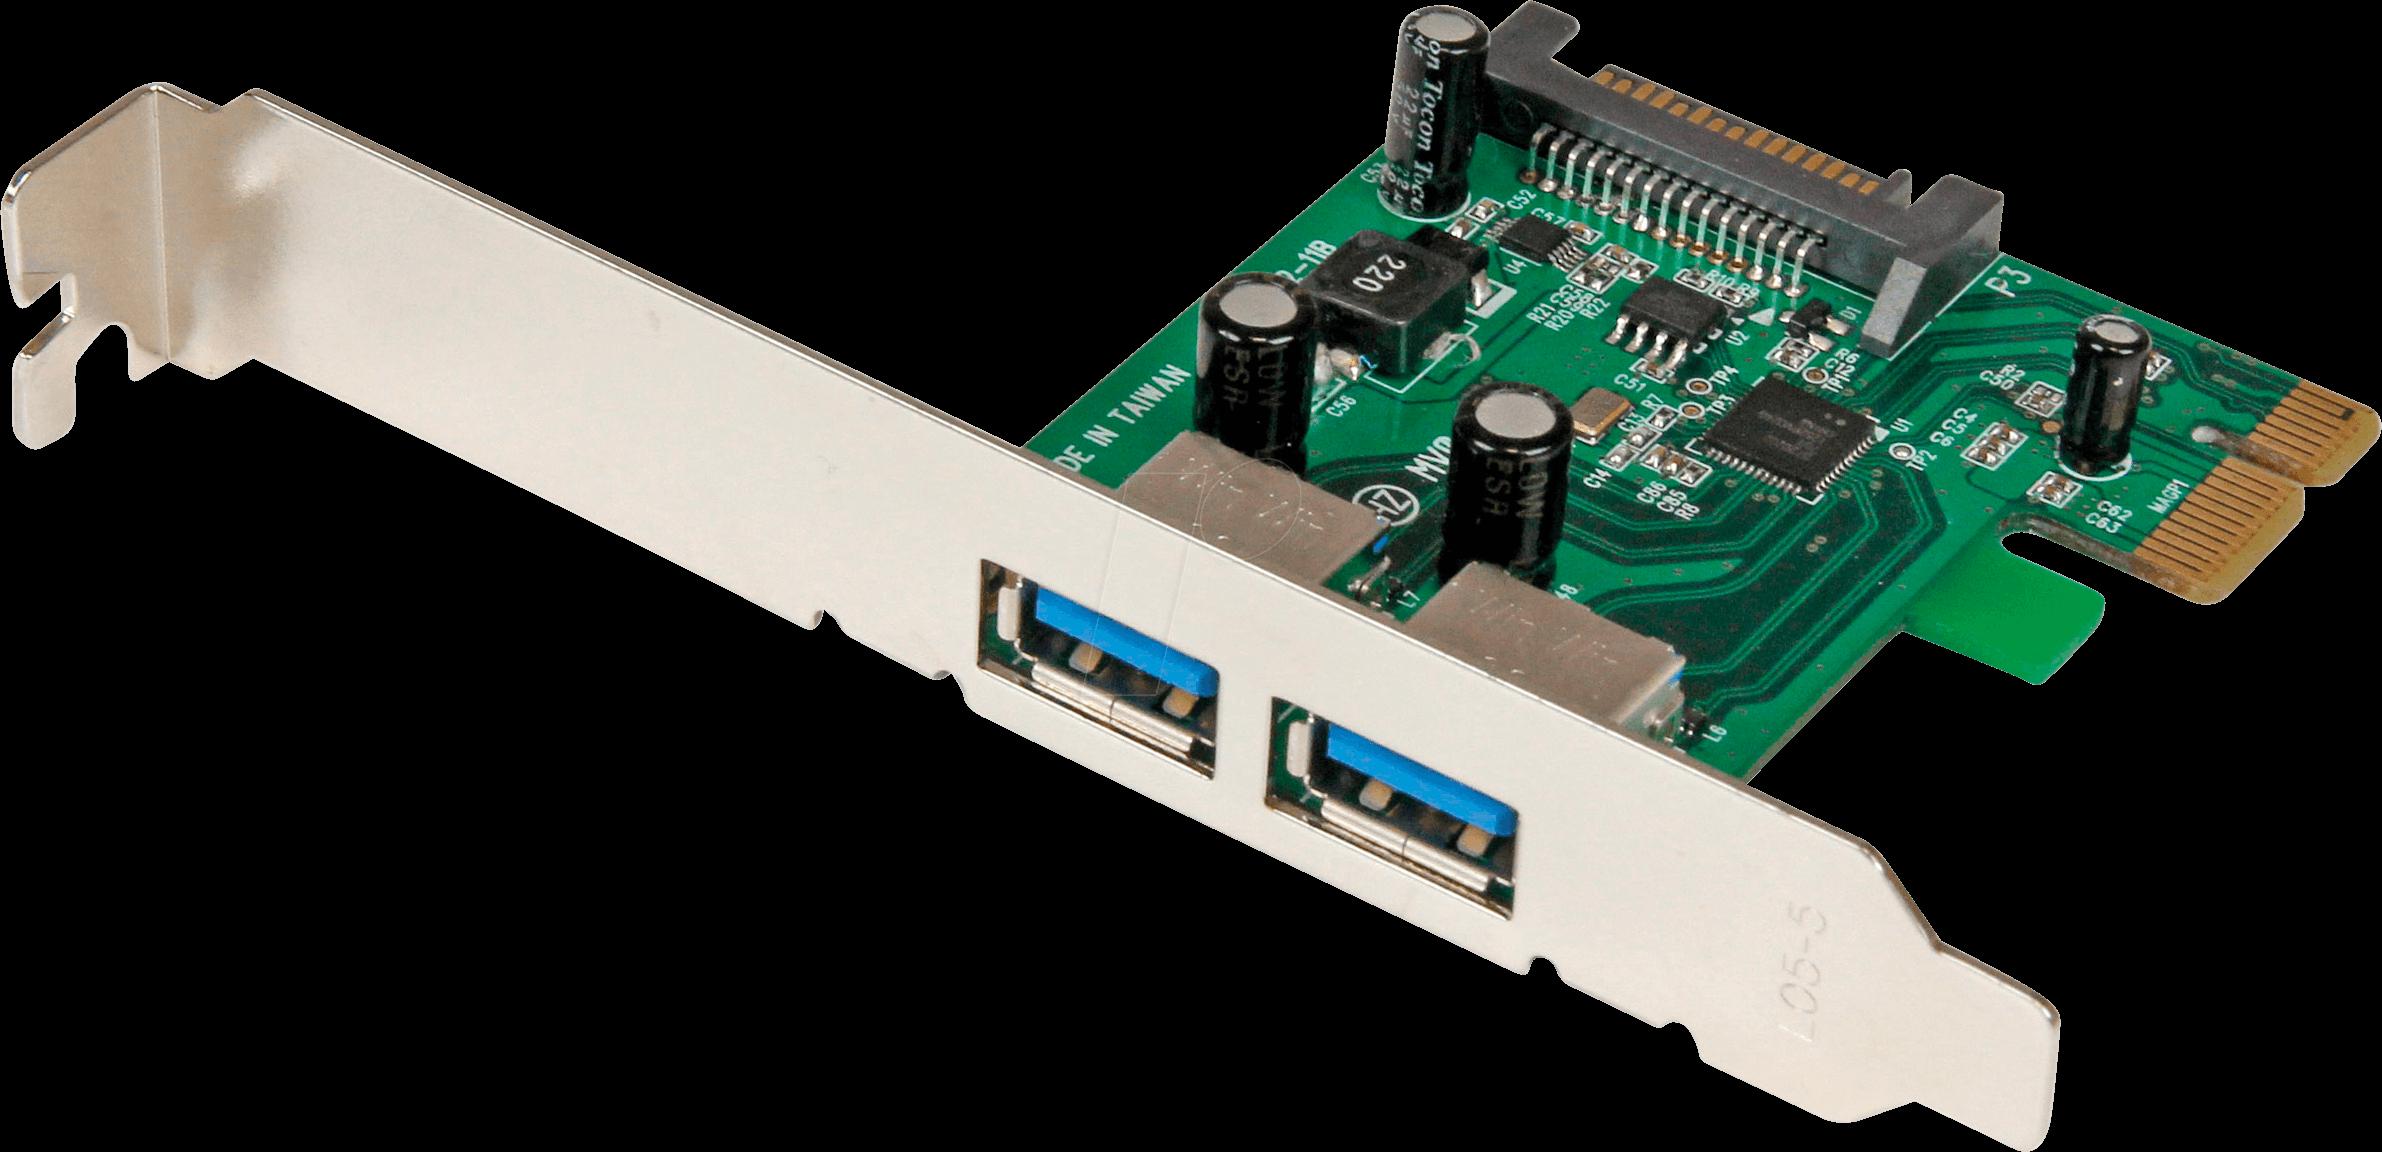 Dual Port PCI USB 3 Controller Card StarTech.com 2 Port PCI SuperSpeed USB 3.0 Adapter Card with SATA Power